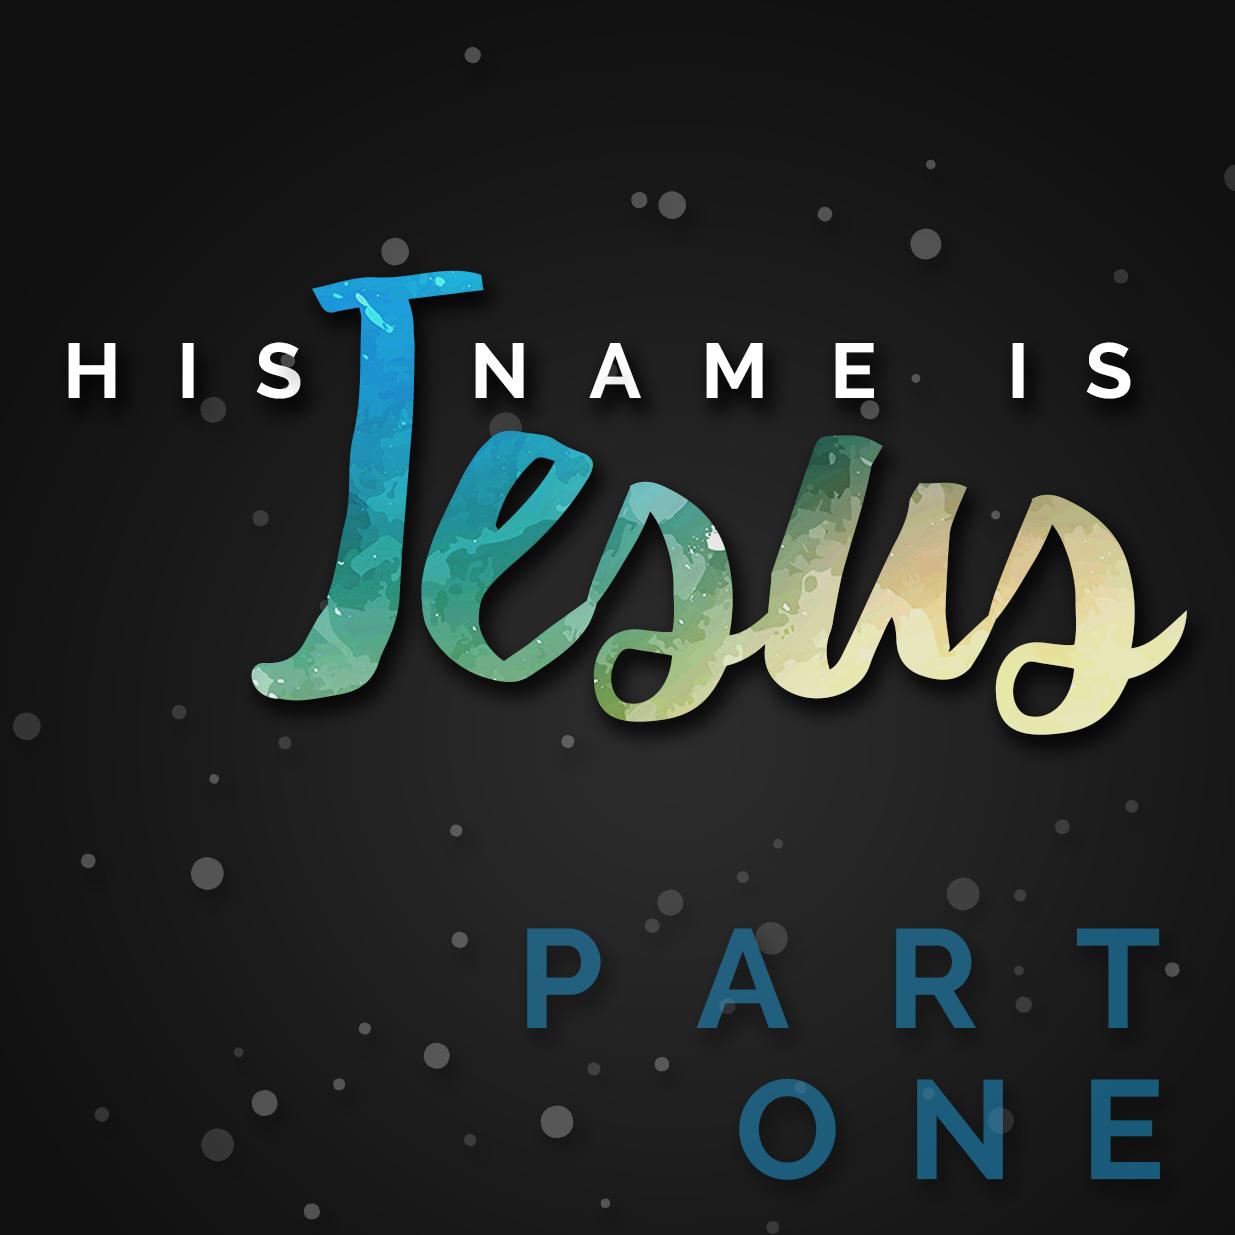 His Name is Jesus: Part 1